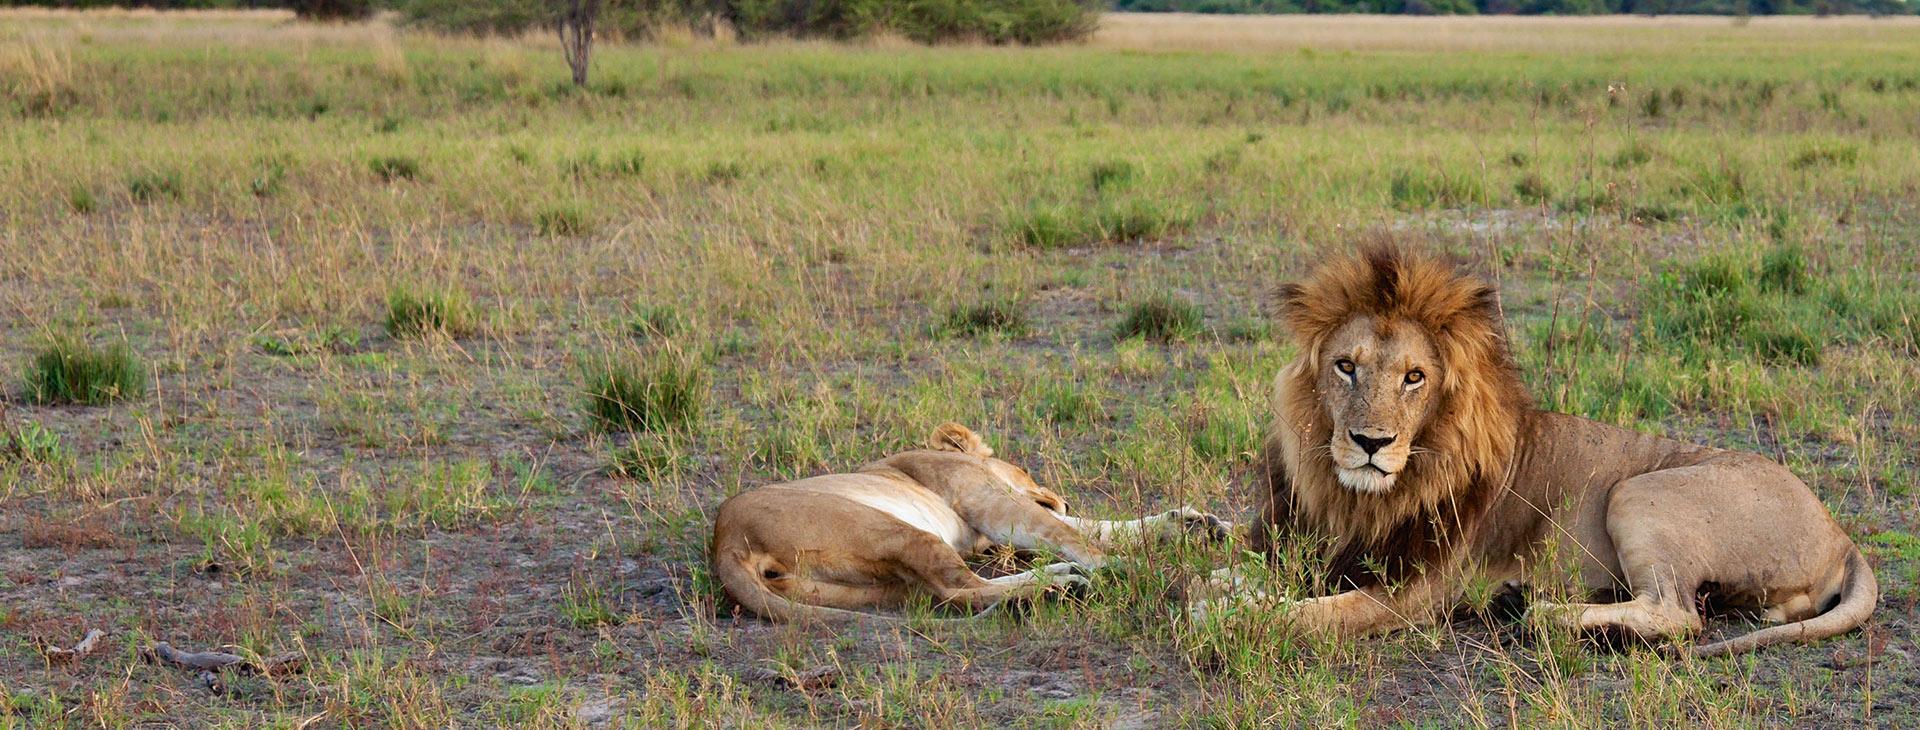 Muslim Honeymoon Safari in tanzania